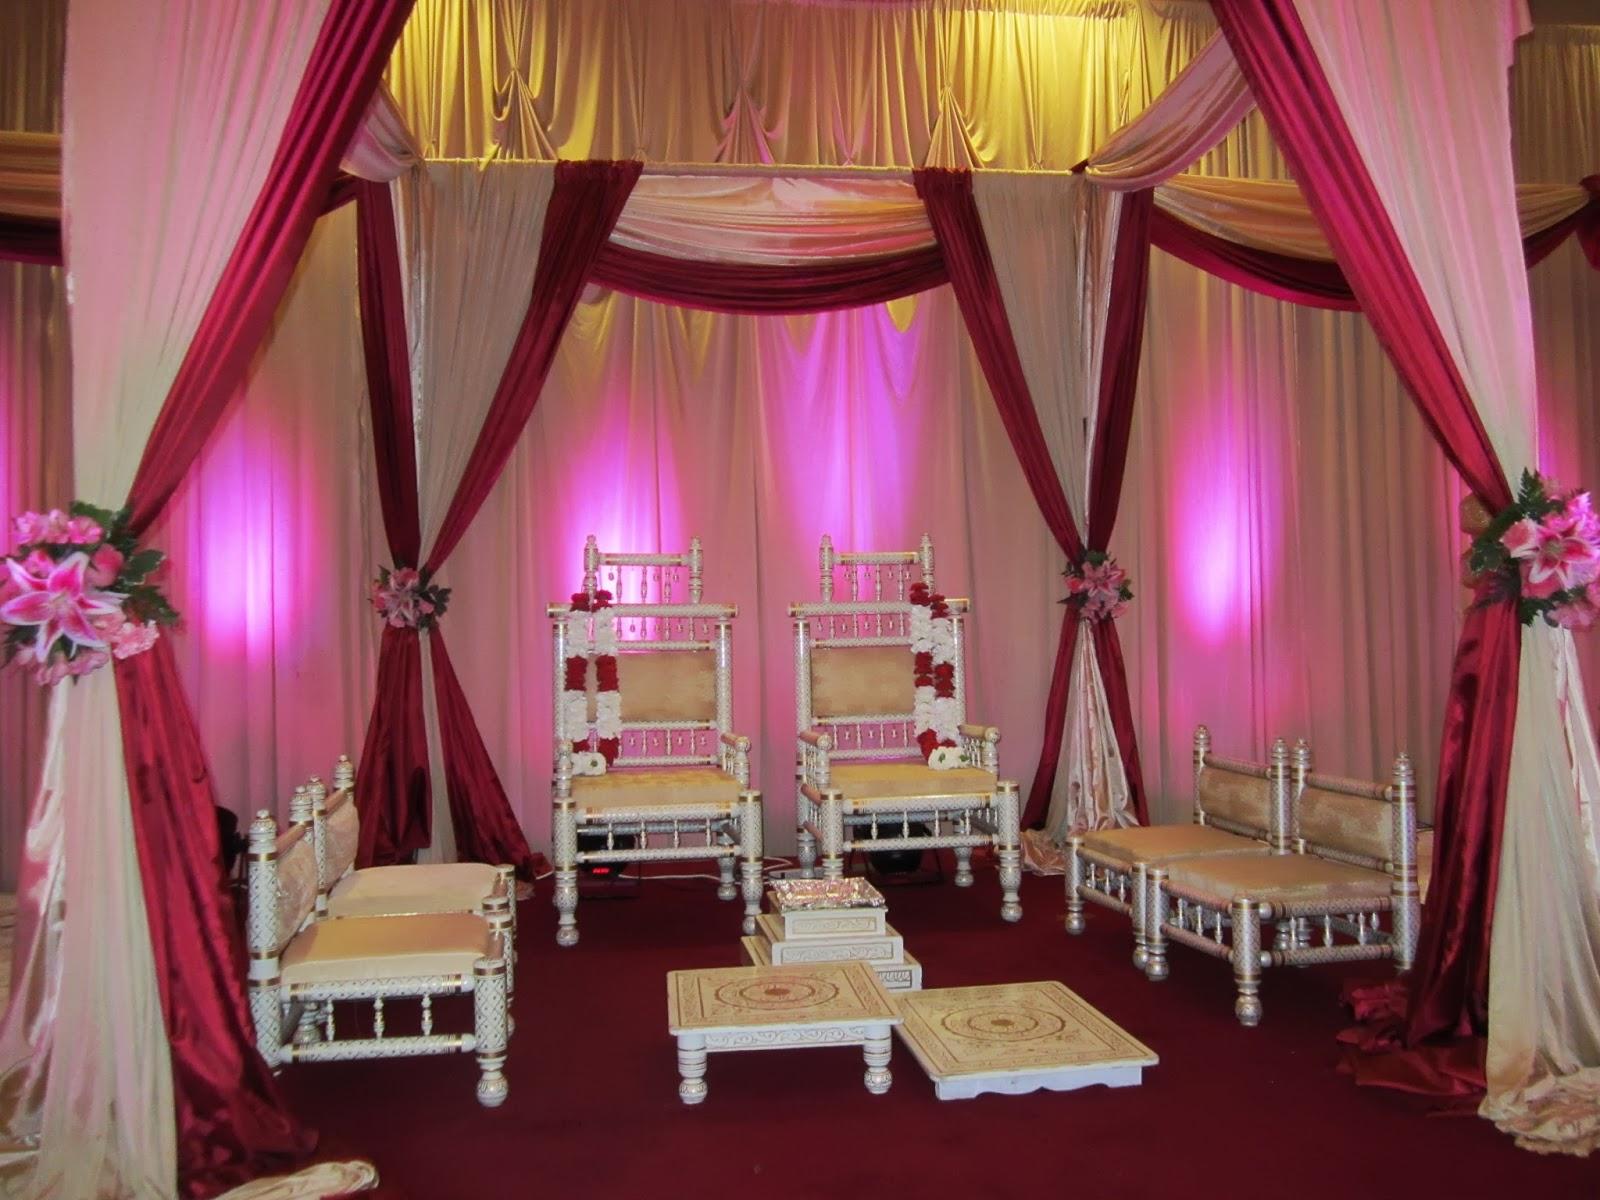 Chicago Marriott Naperville Blog: South Asian Weddings